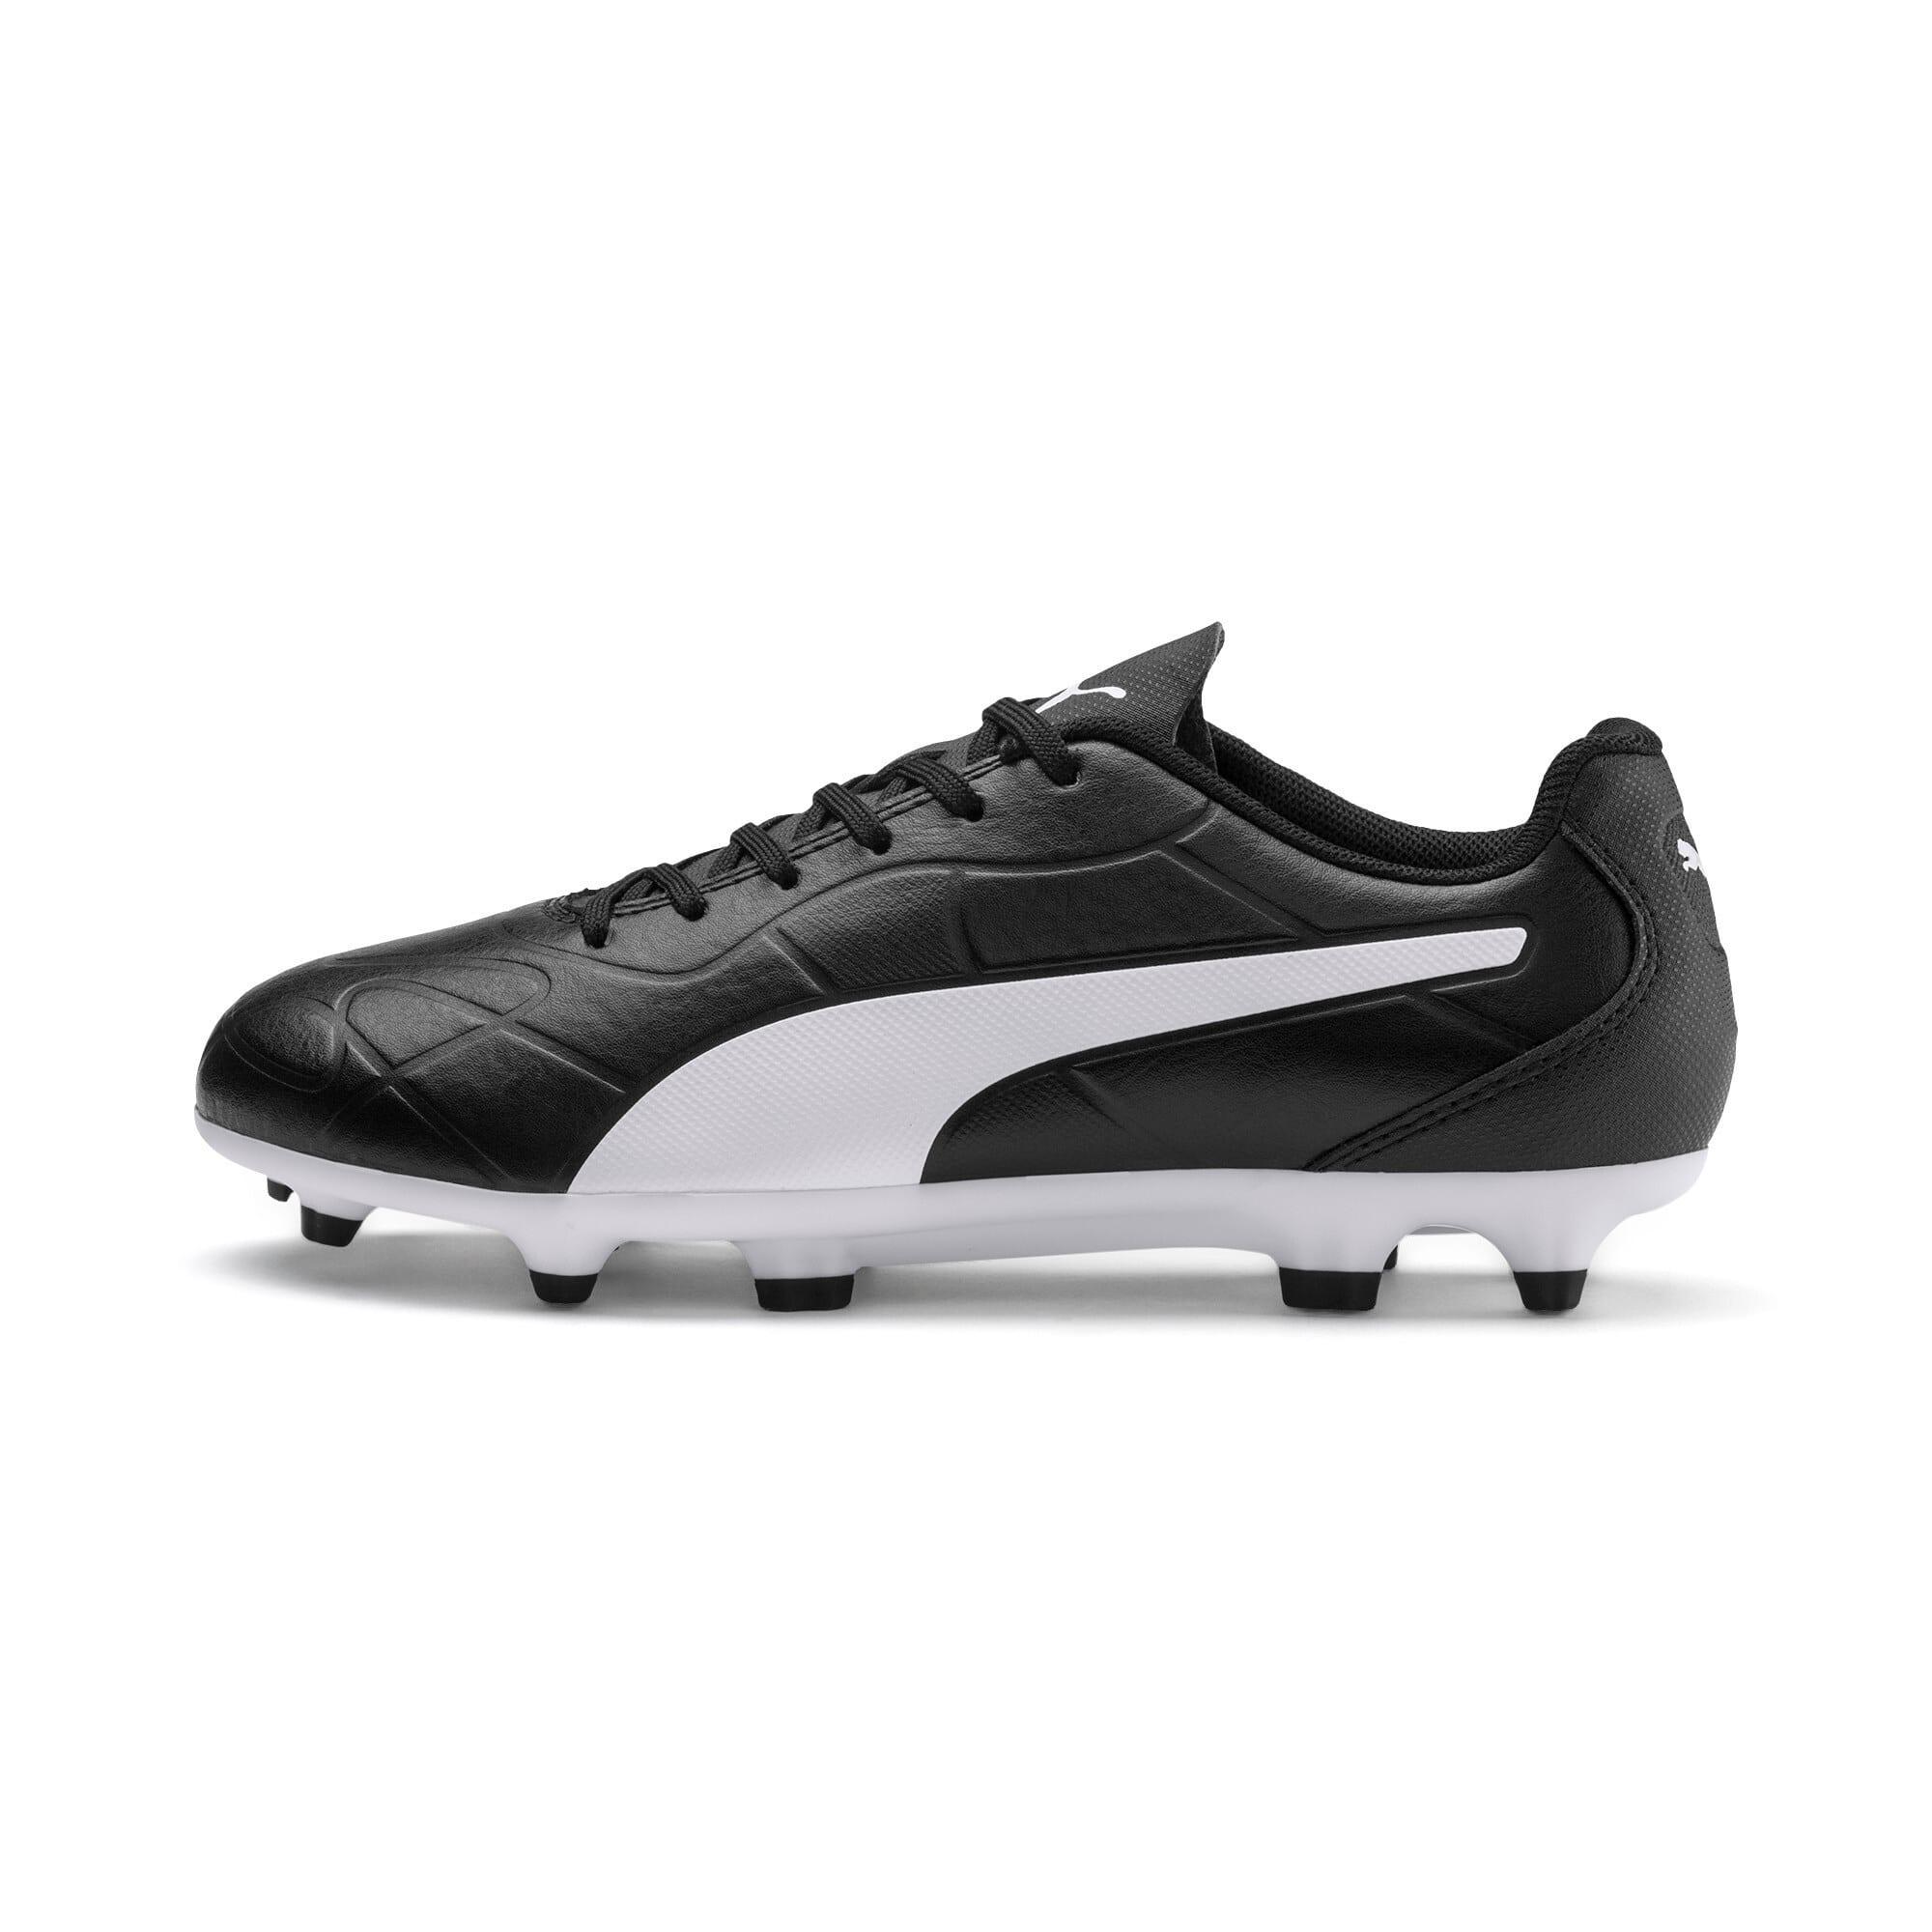 Thumbnail 1 of Monarch FG Youth Football Boots, Puma Black-Puma White, medium-IND